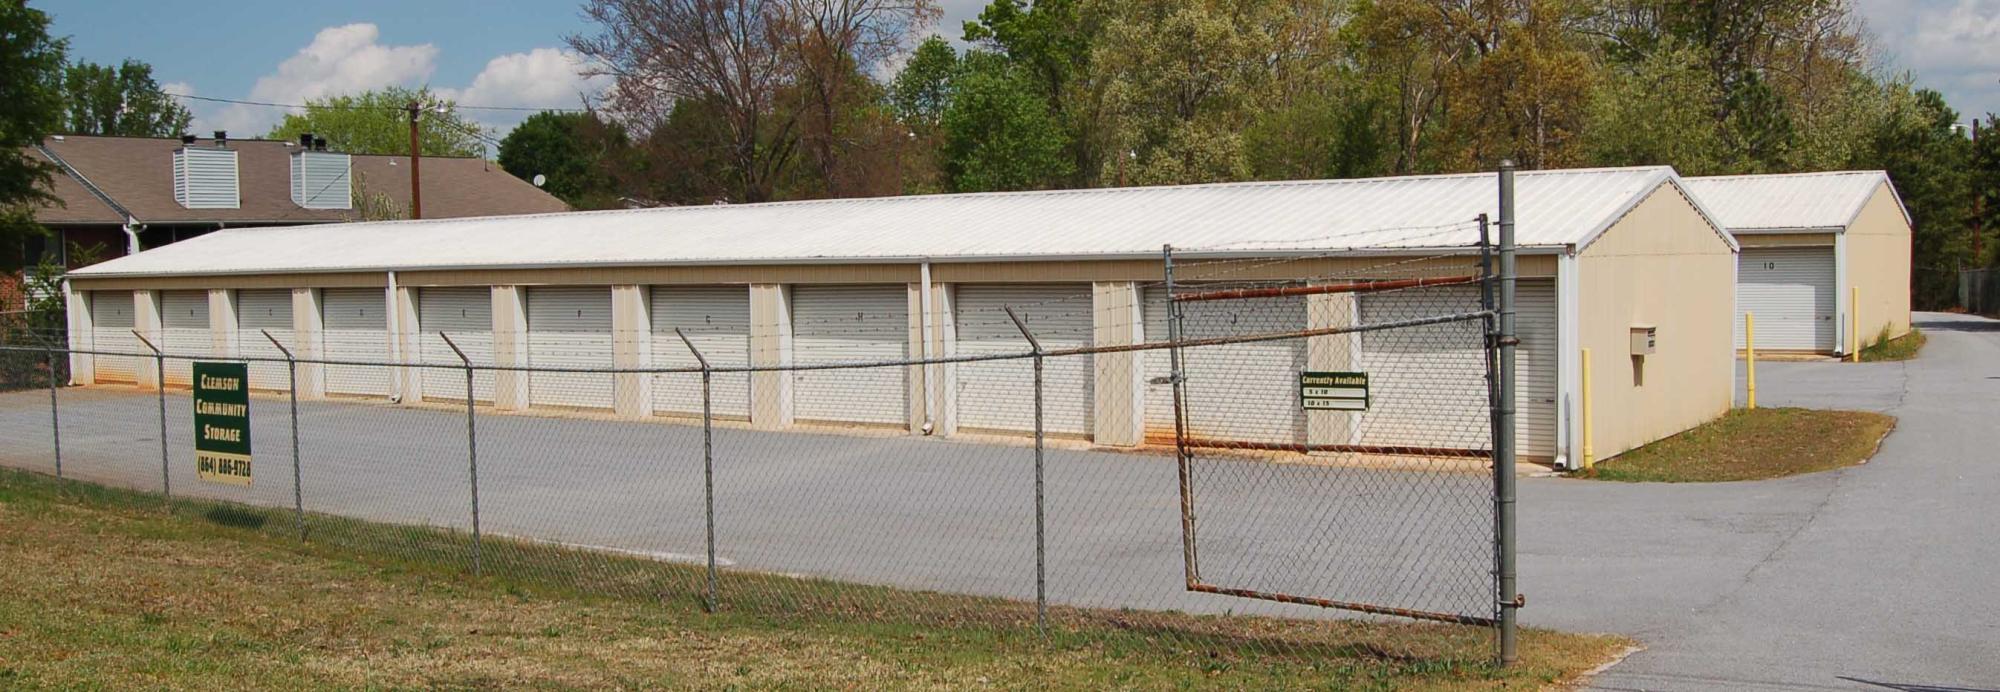 Clemson Community Storage